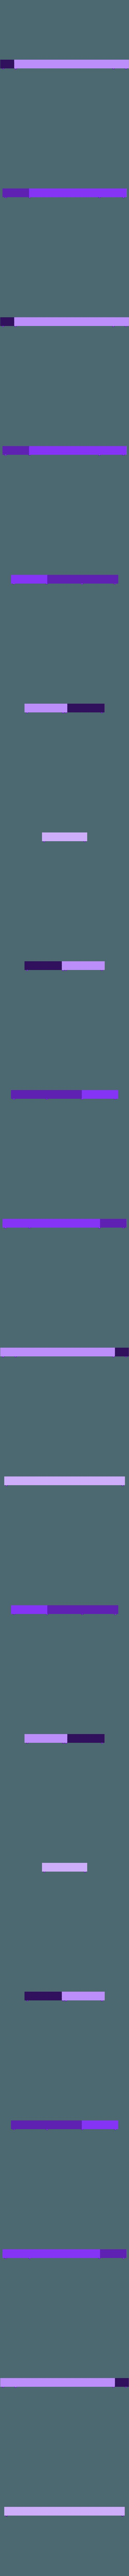 28mm_mini_case_SQUAREINSETSTUDSnameplate.stl Download free STL file 28mm mini plinth remix; featuring name plates • Object to 3D print, daftpirate15